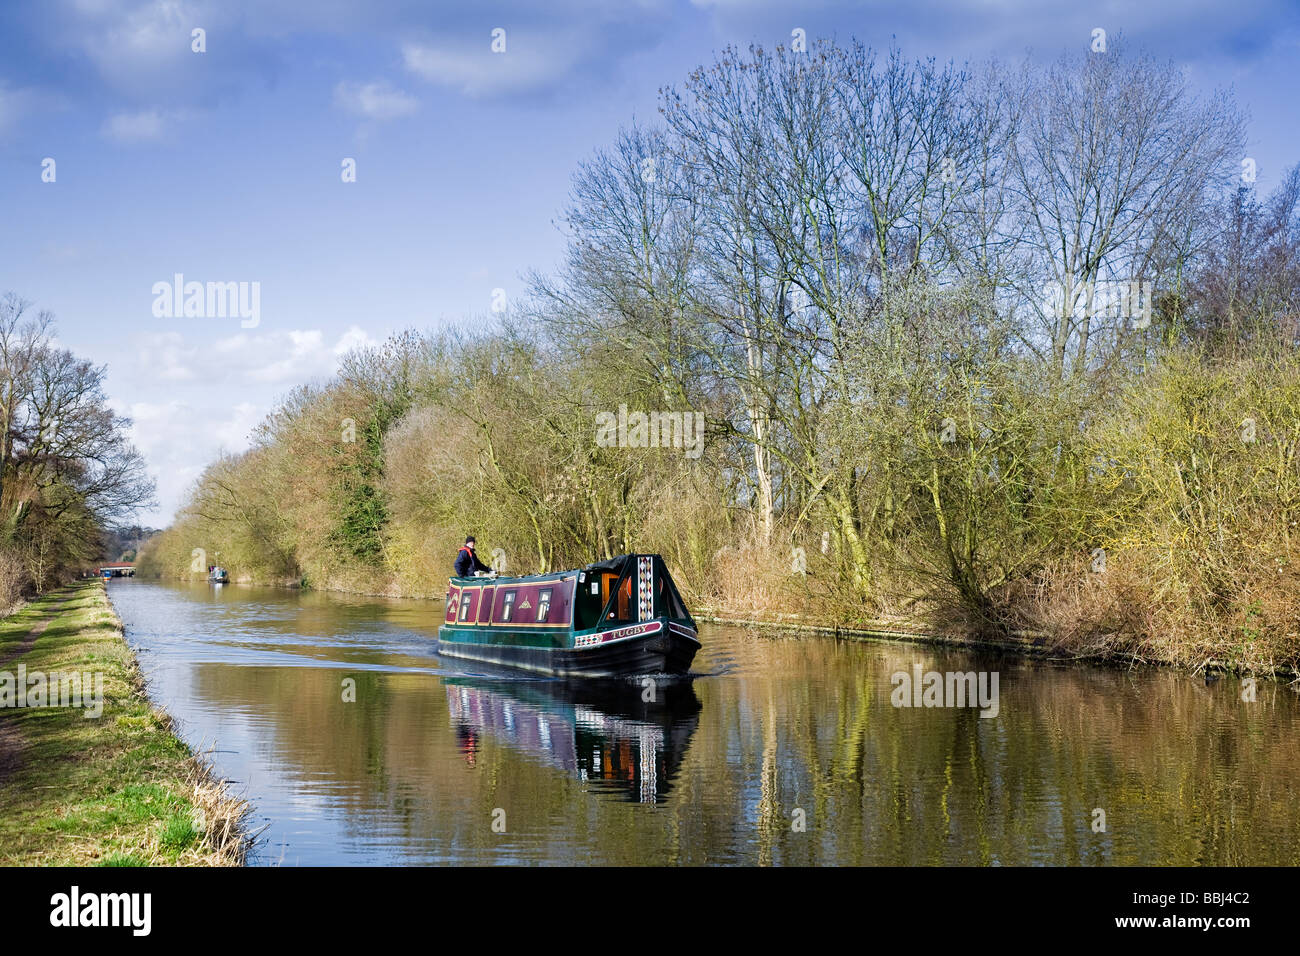 Grand Union Canal and Narrowboat 'Tugby', near Denham Green, Buckinghamshire, England - Stock Image